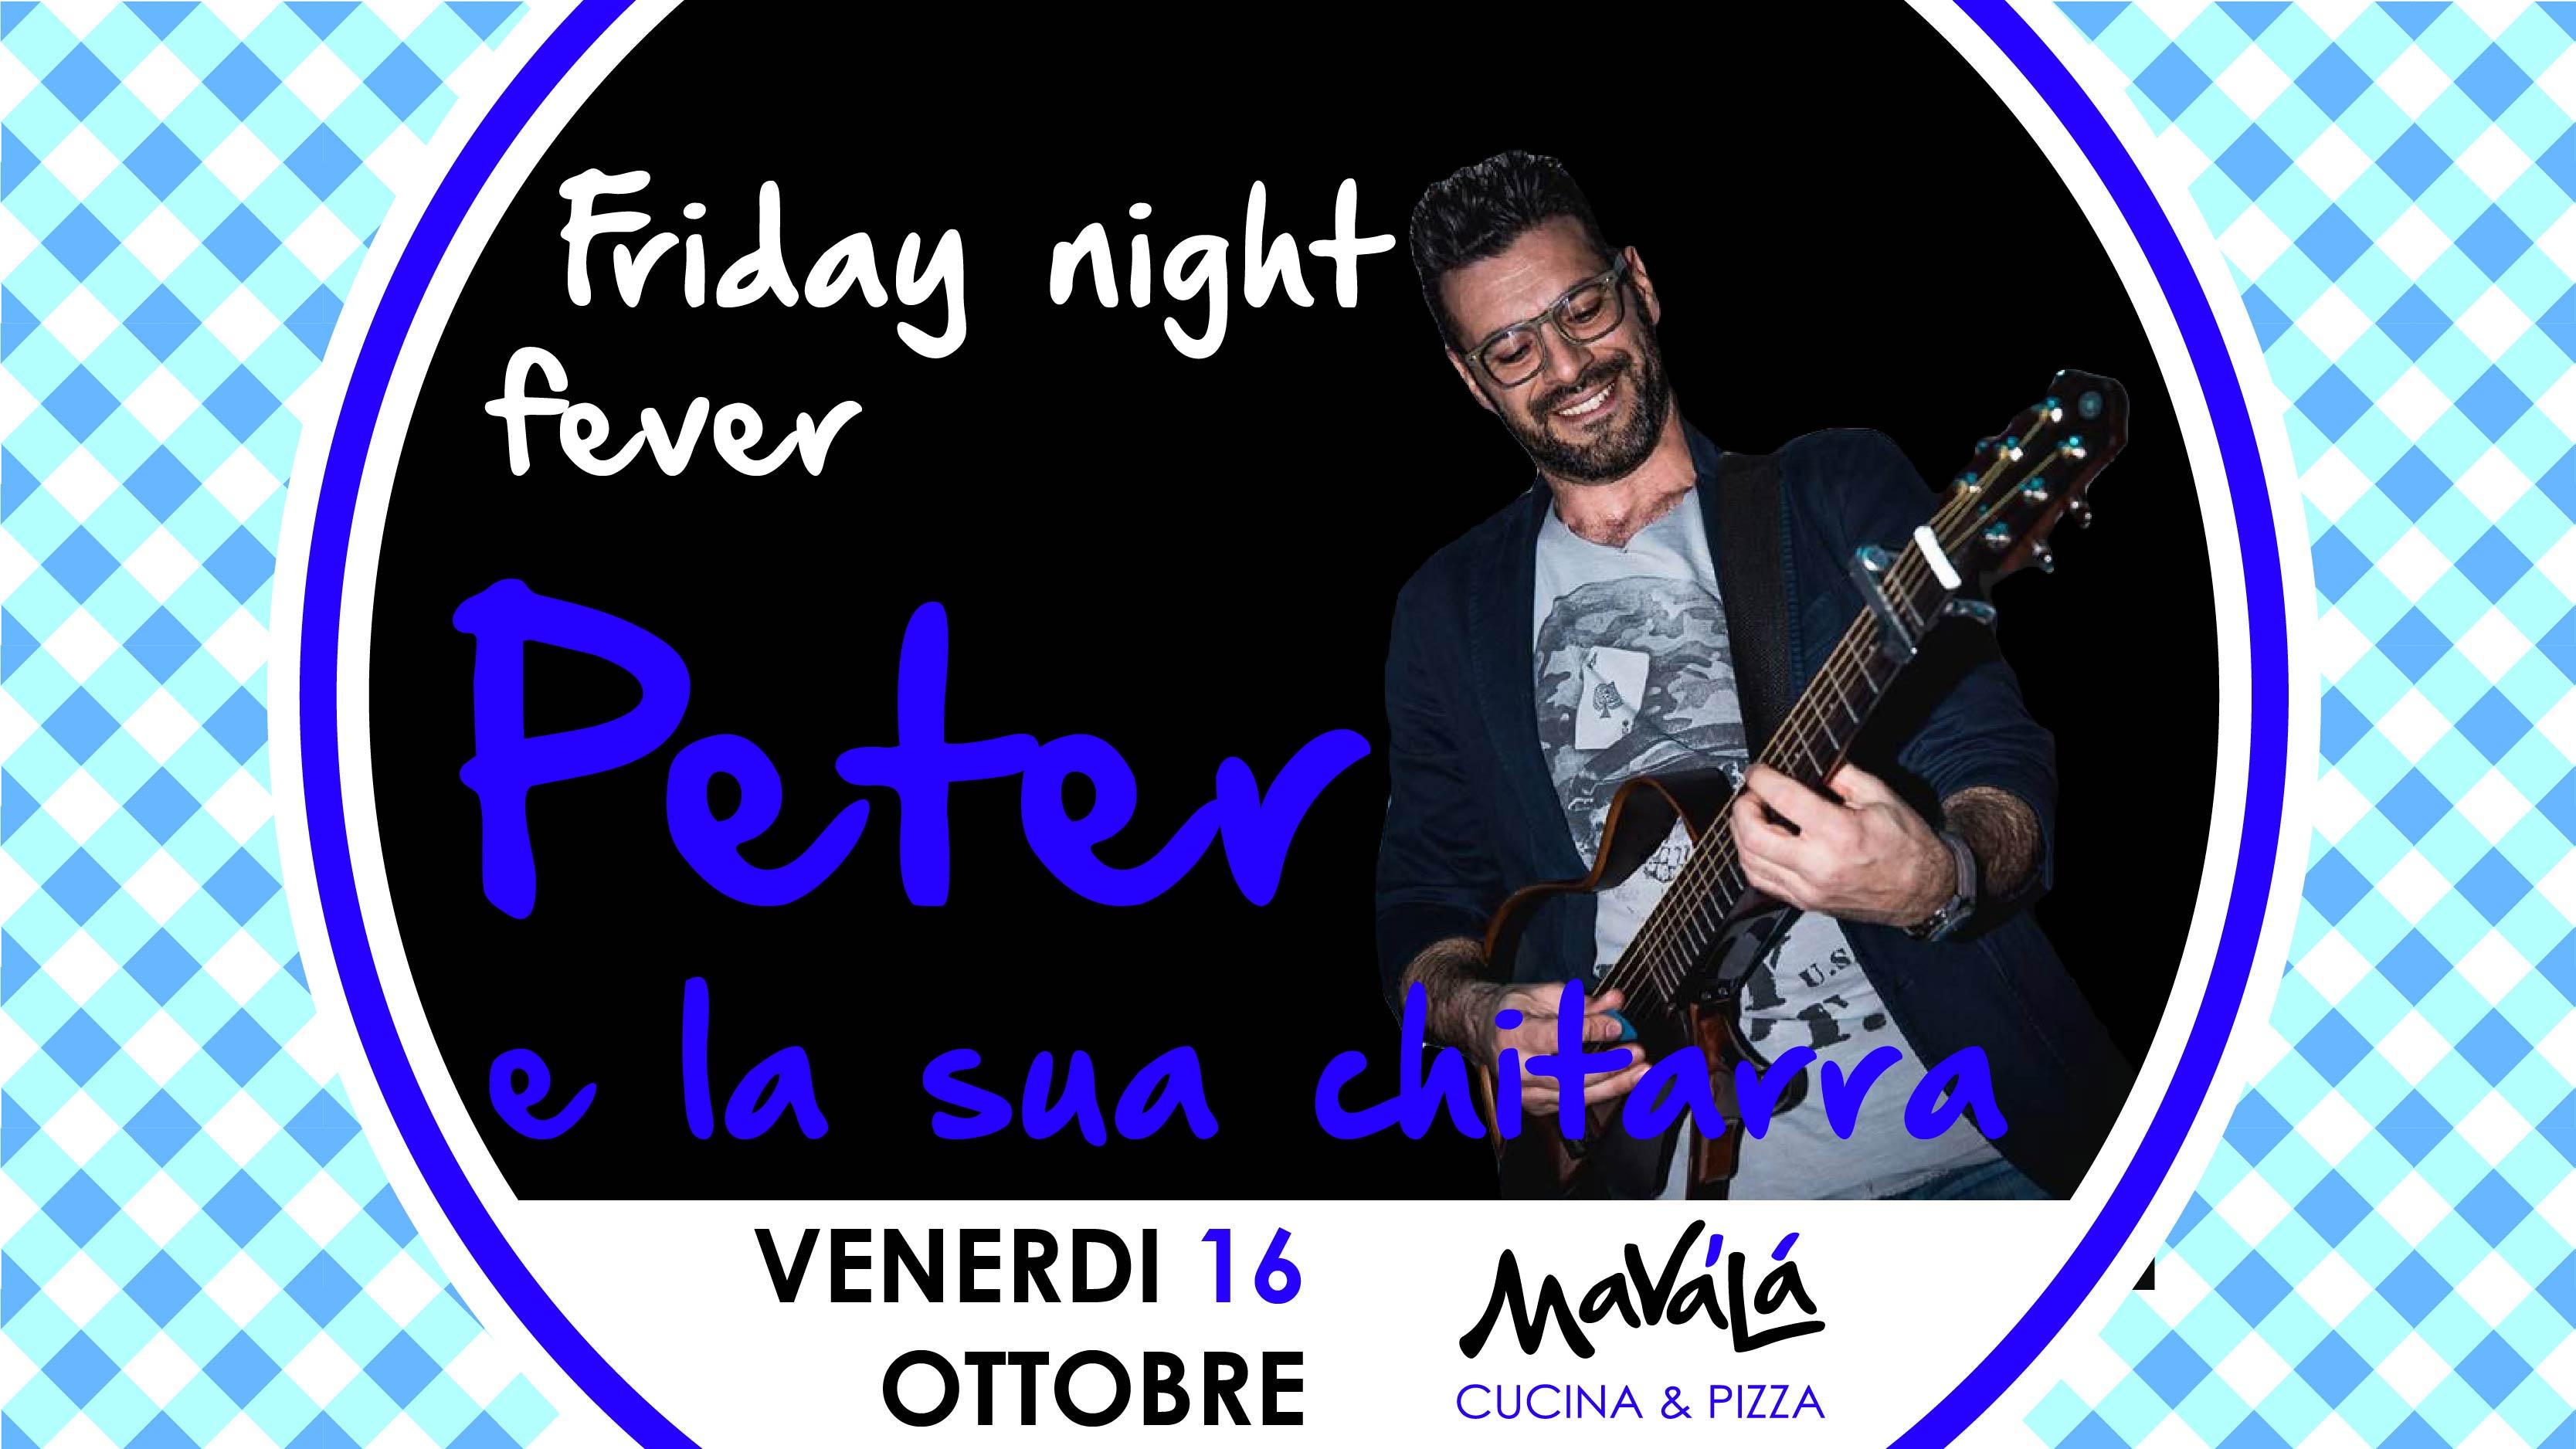 MAVALA_LOCANDINE_16_OTTOBRE_PETER-04